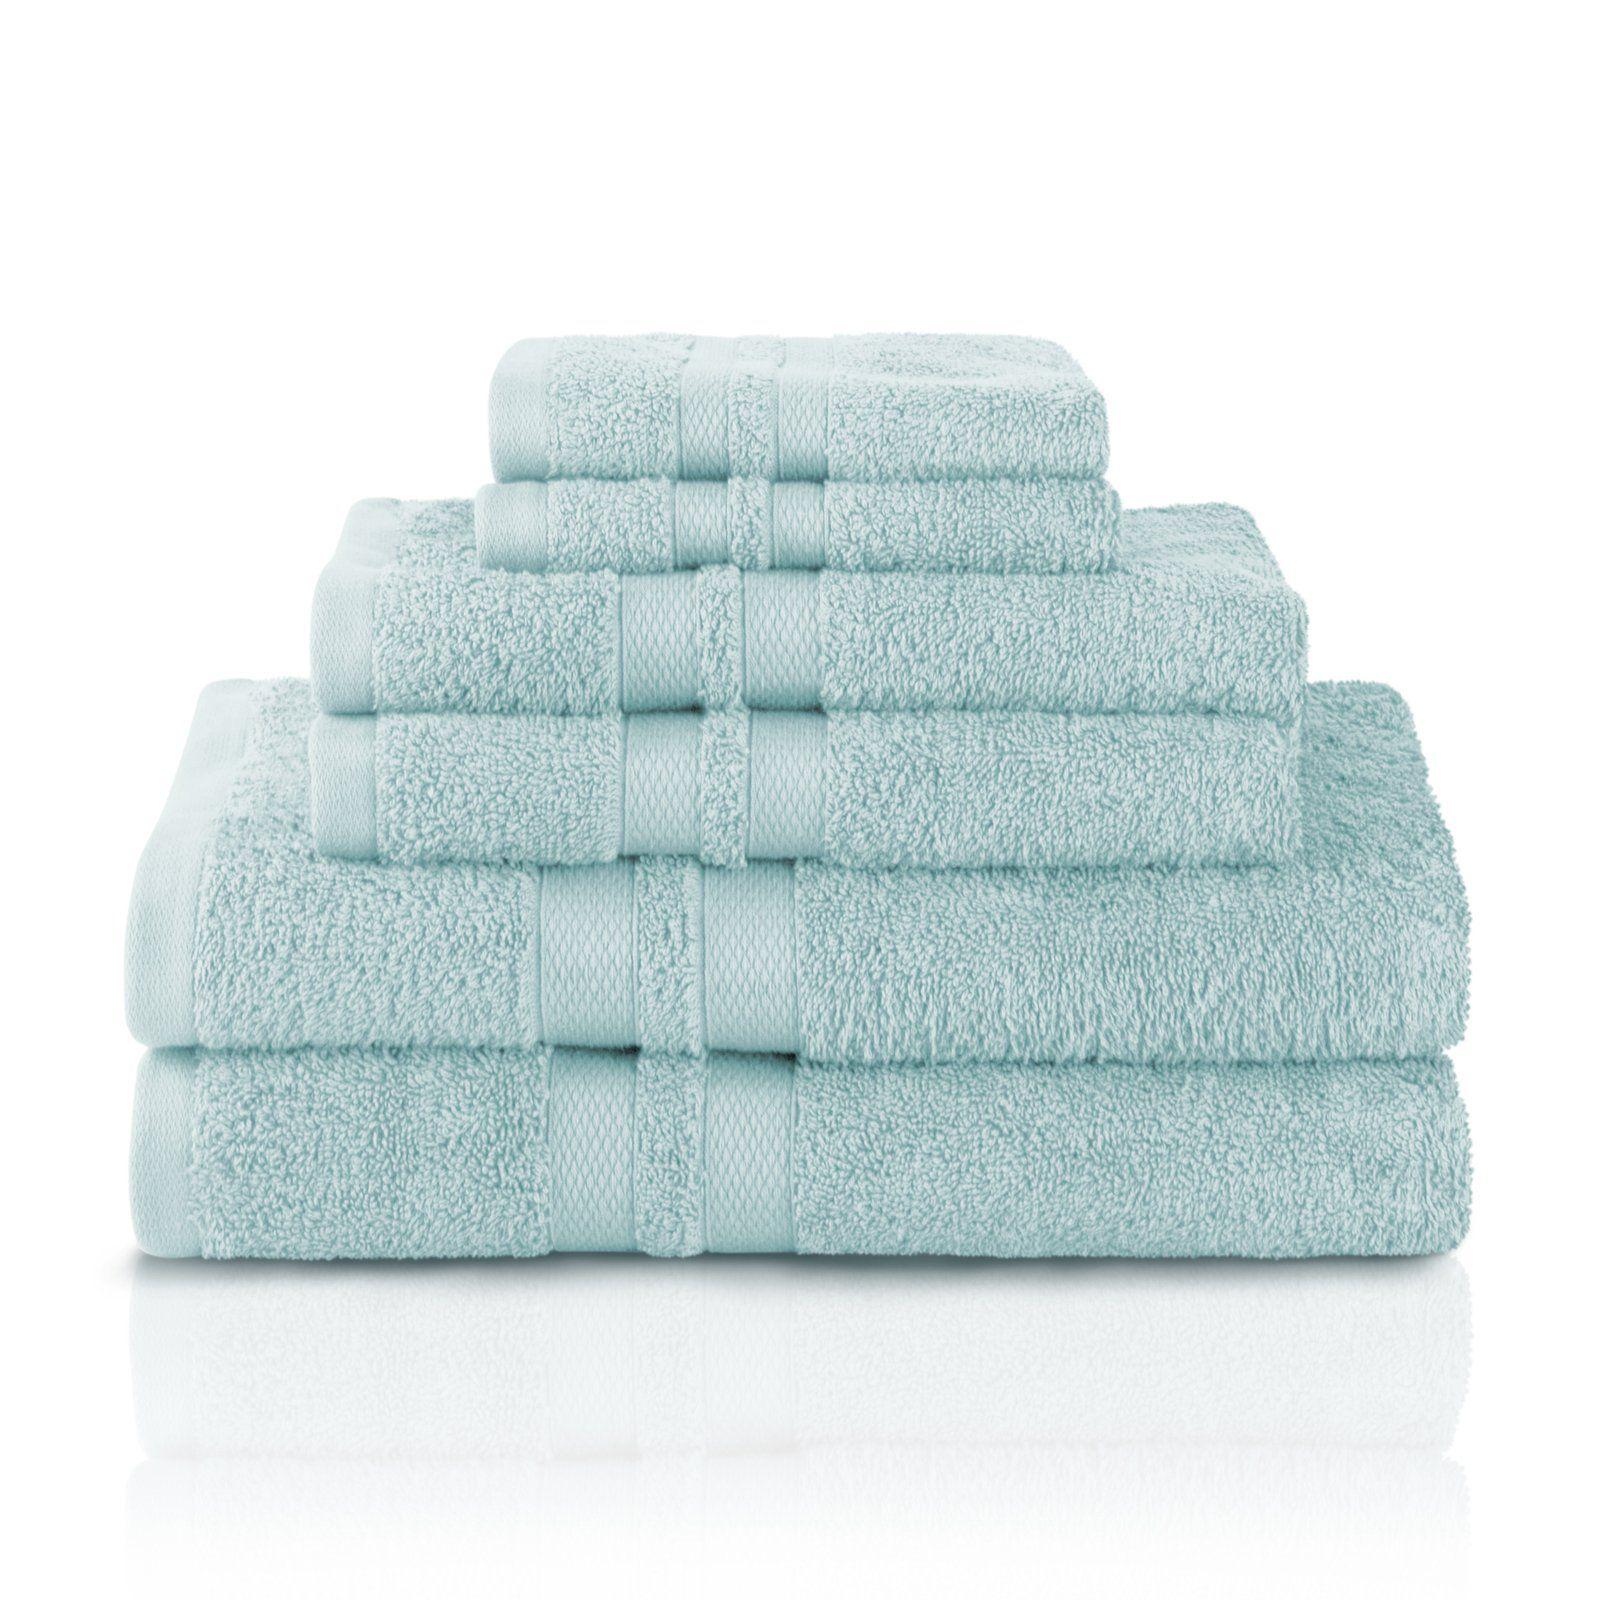 Luxury Towels Set Bale Egyptian Cotton 100/% Bath Sheet Hand Large 600 GSM Soft